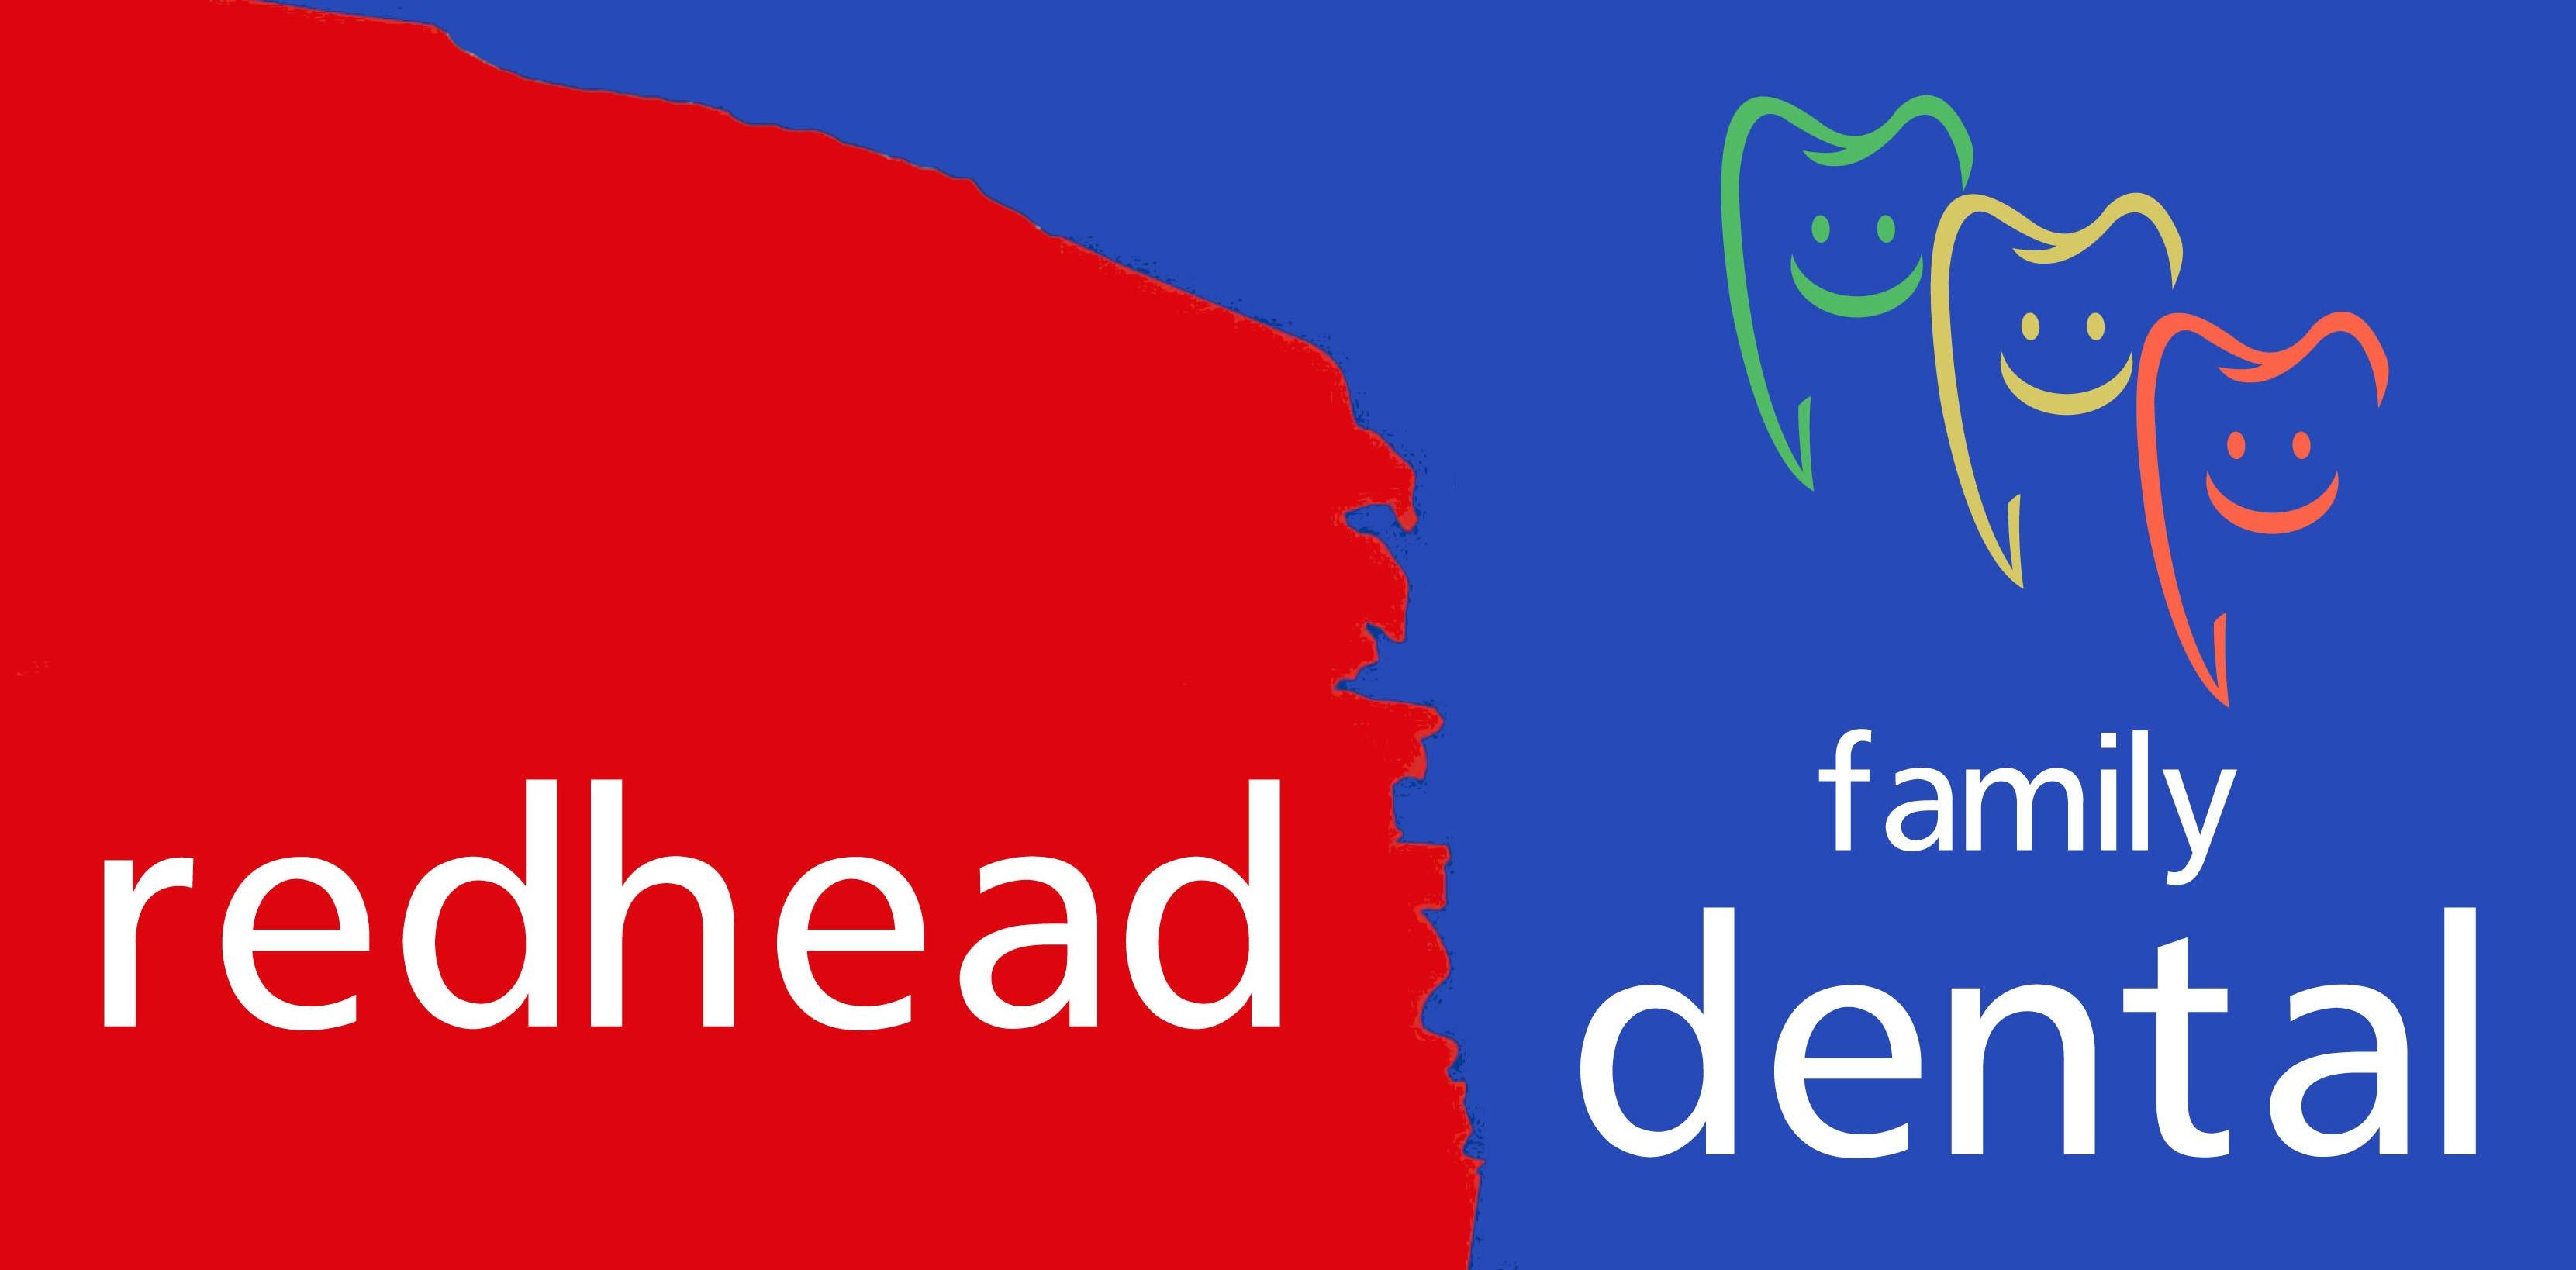 Redhead Family Dental